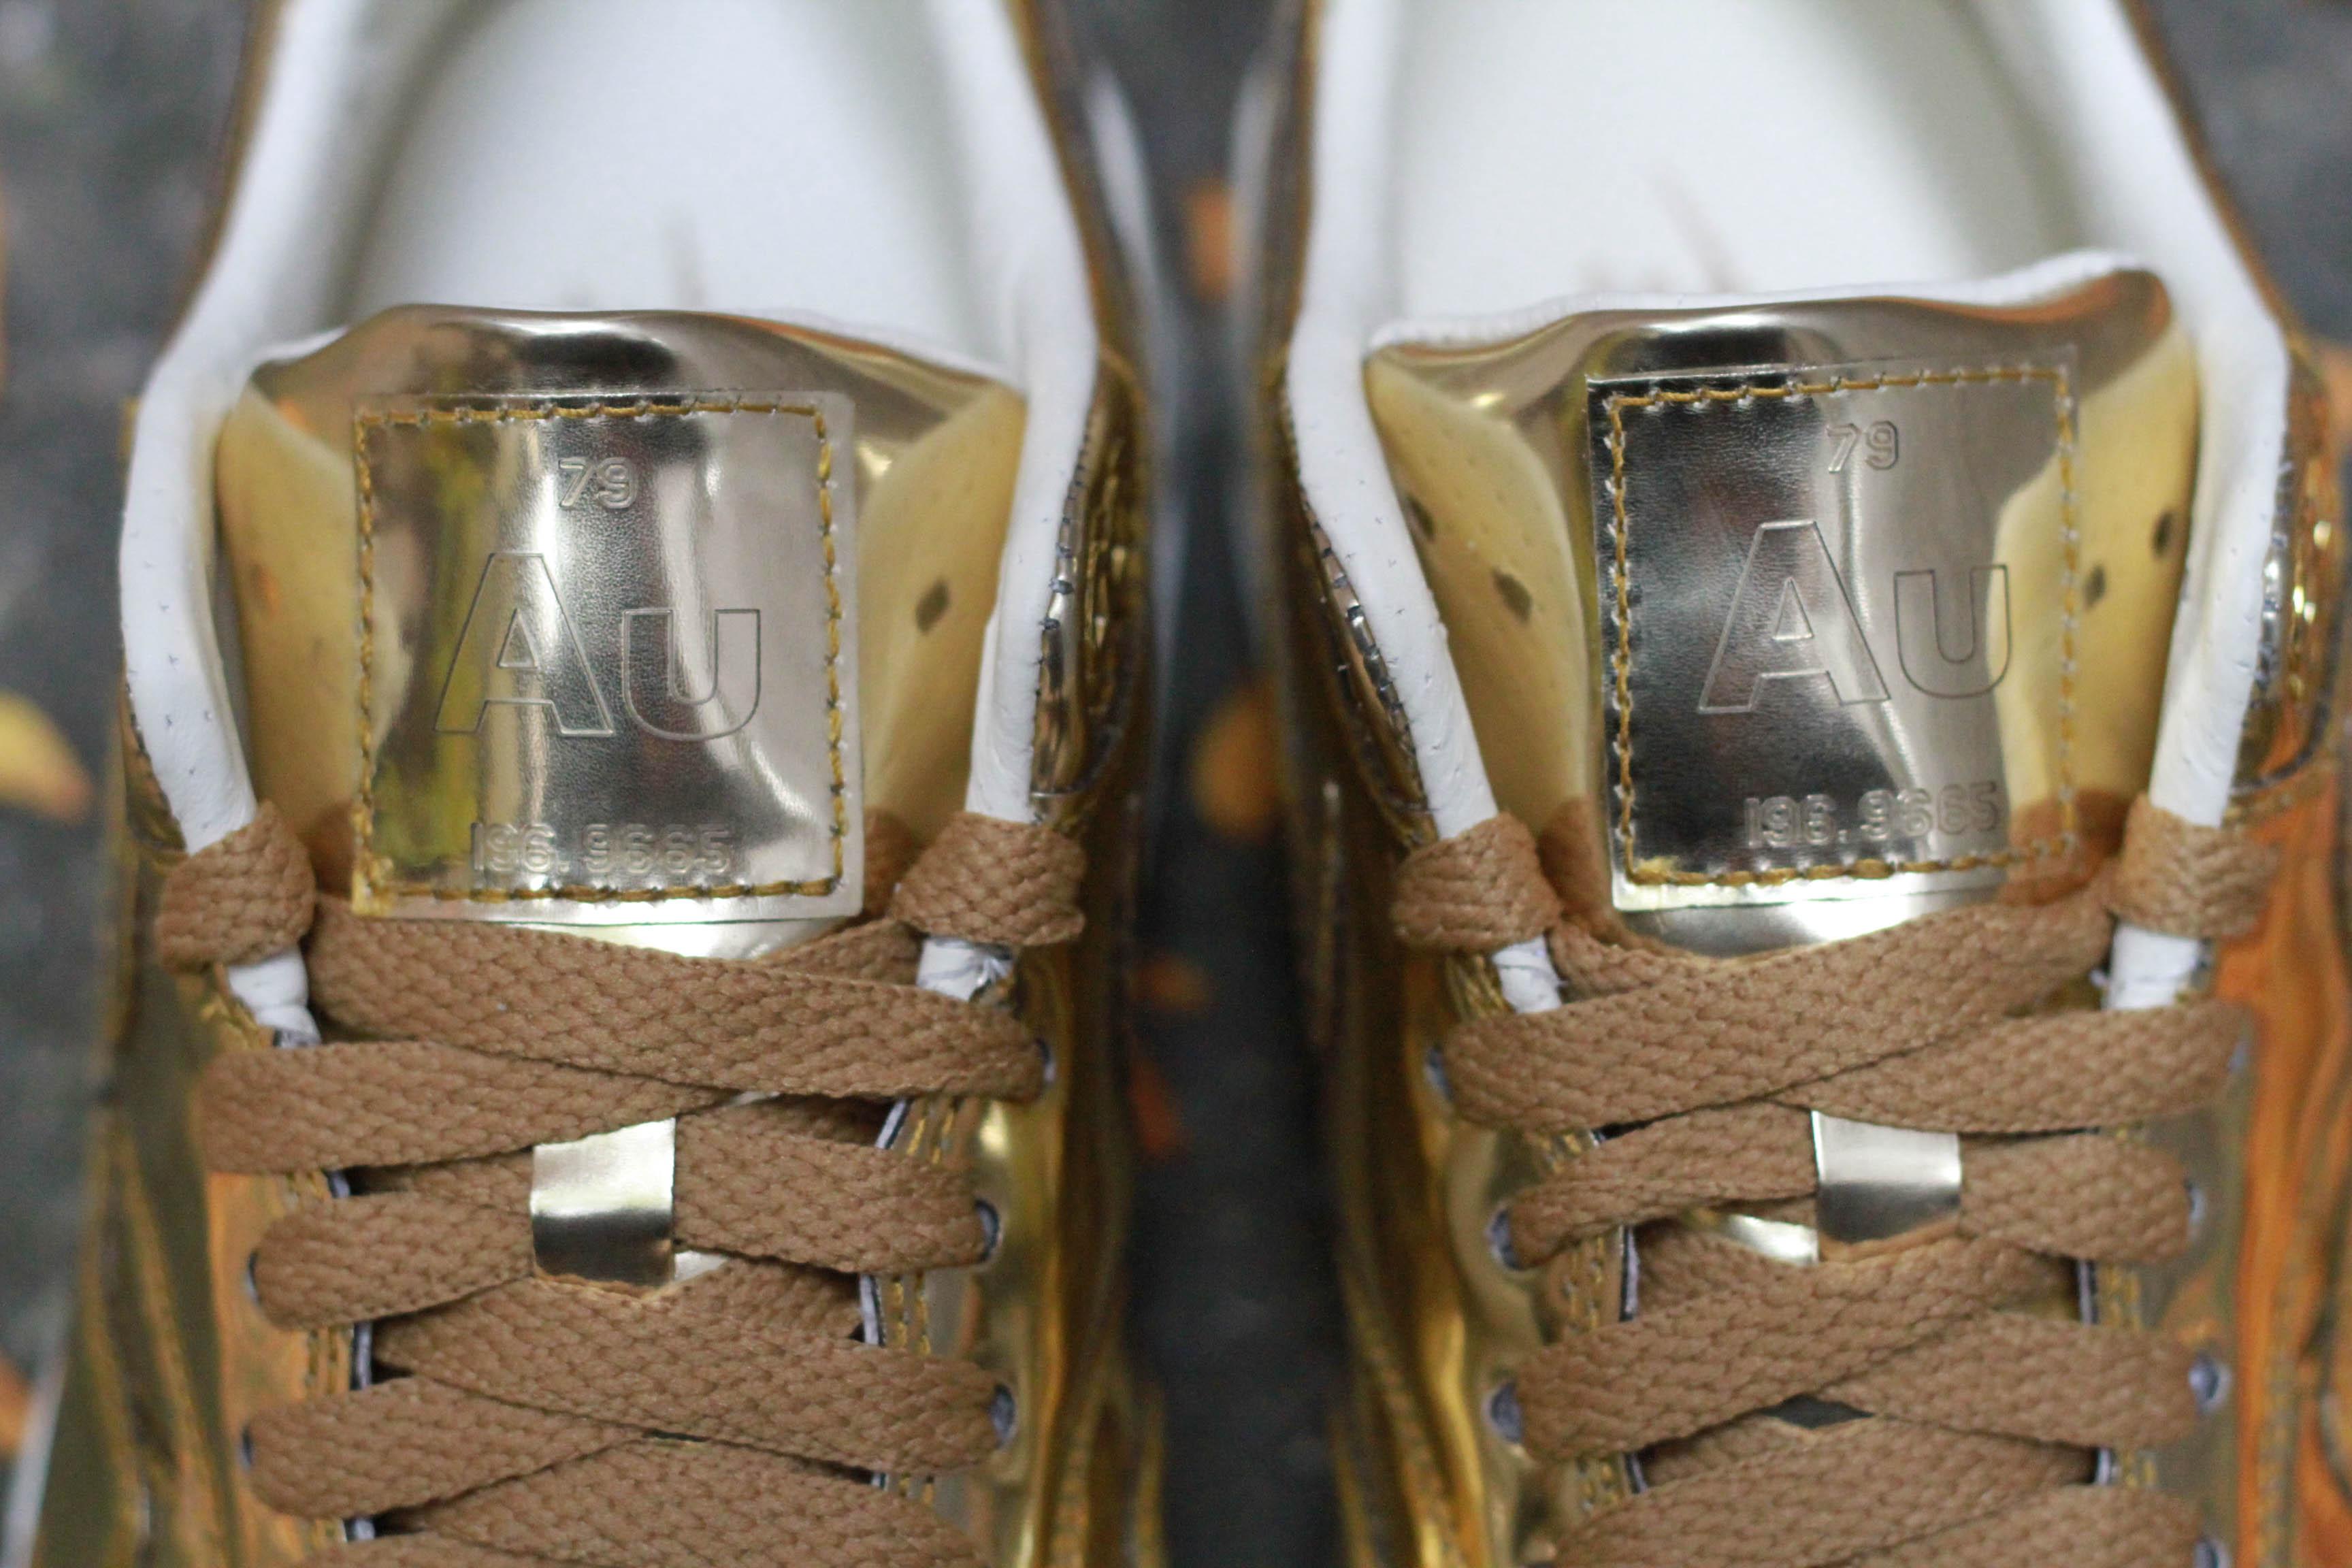 Nike Air Max 1 SP liquid metal 79 Au